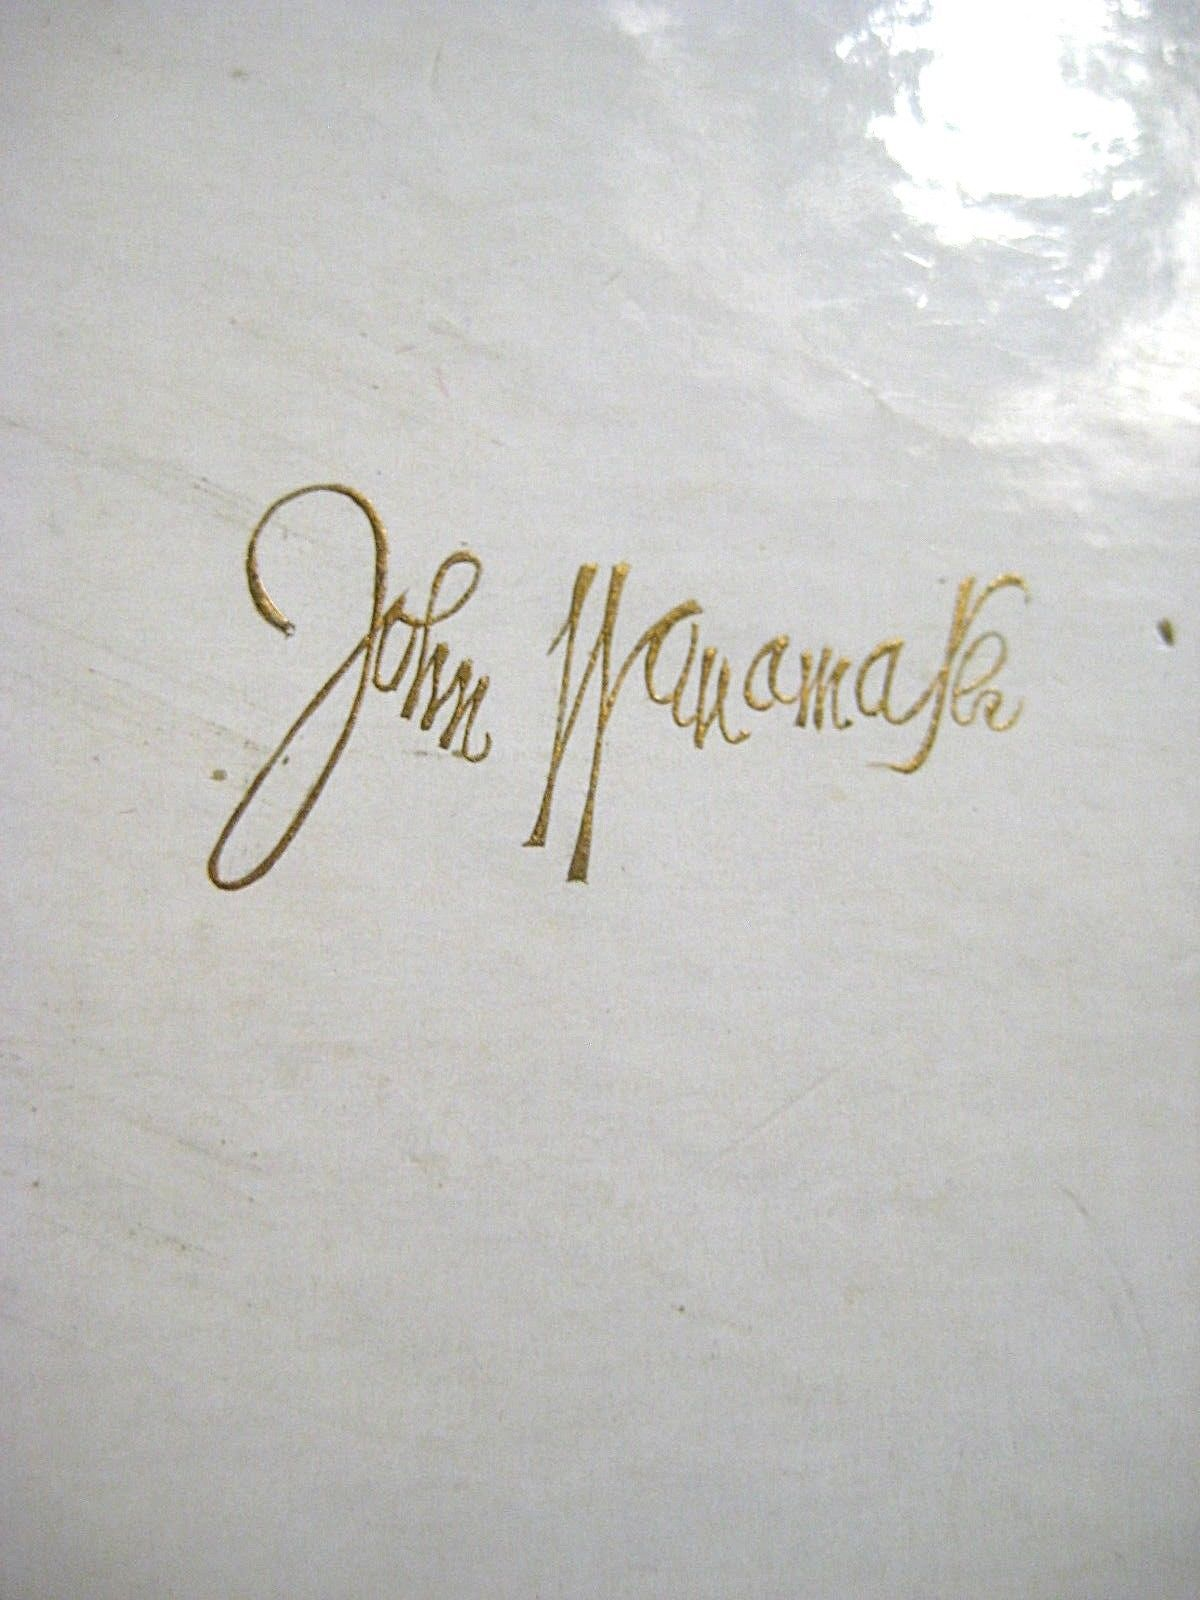 Large Vintage CORO Brooch Gold tone Flower in Original John Wanamaker Box Tags image 7